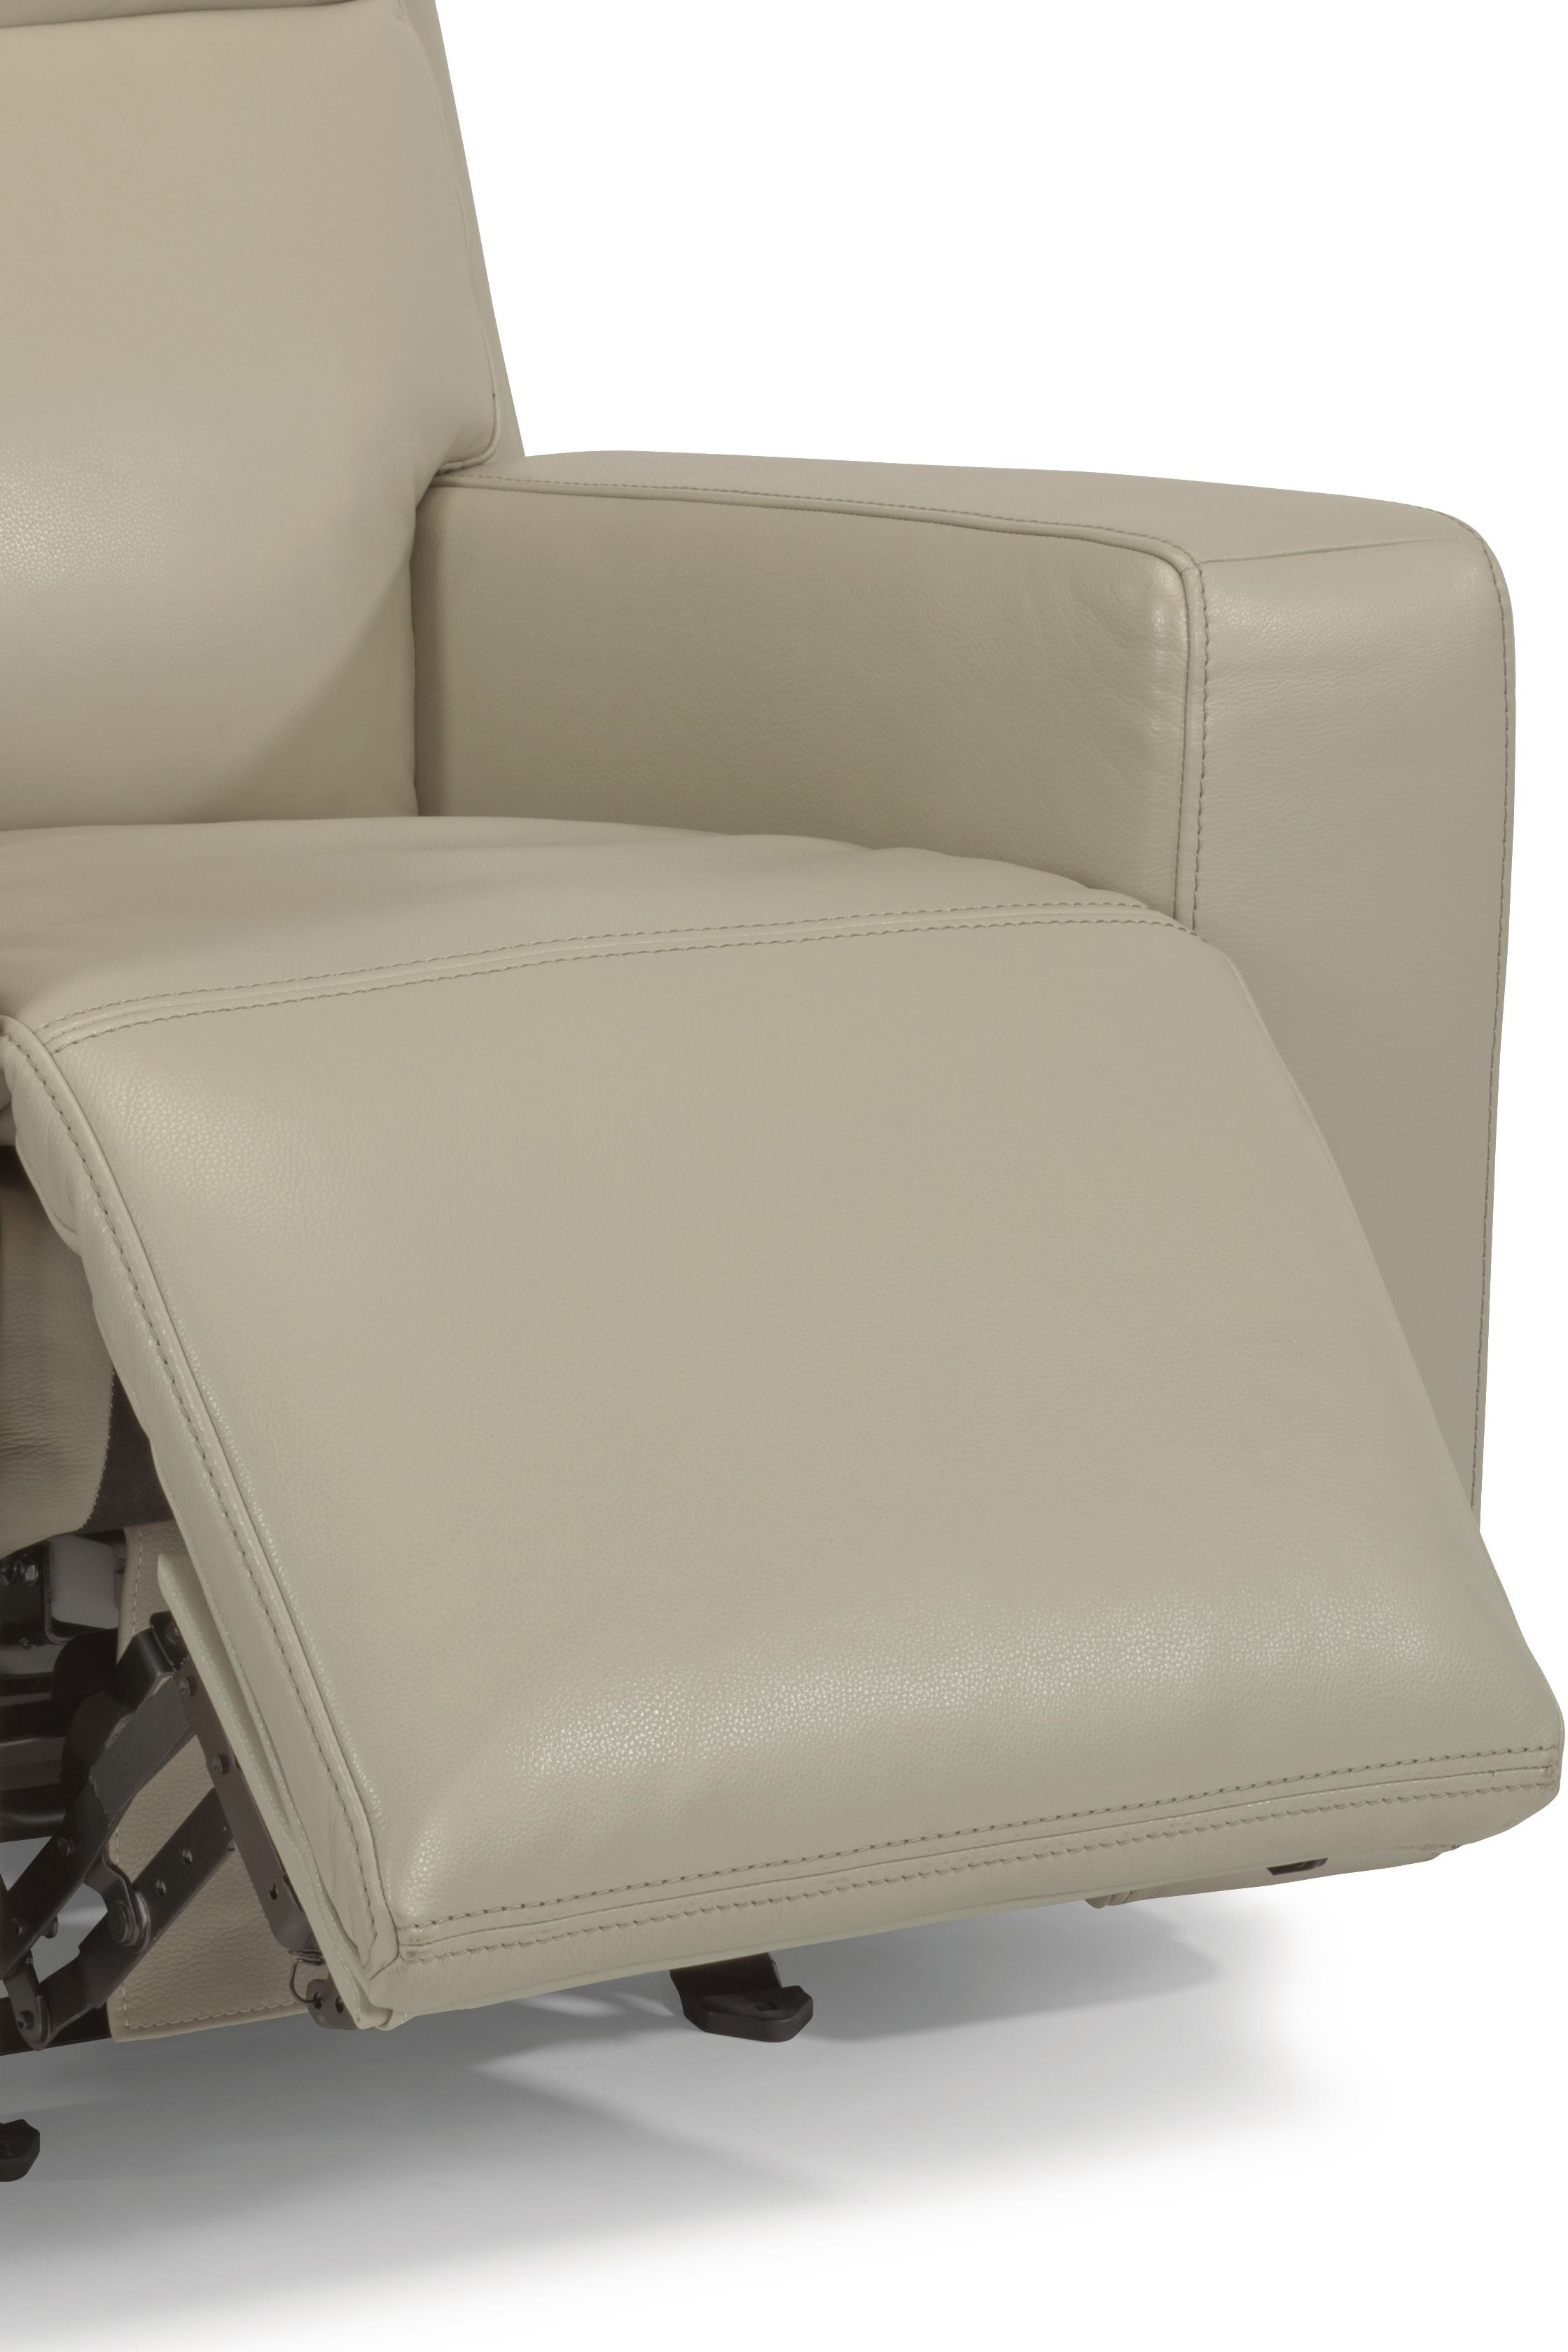 Latitudes Niko 1181 By Flexsteel Hudson S Furniture